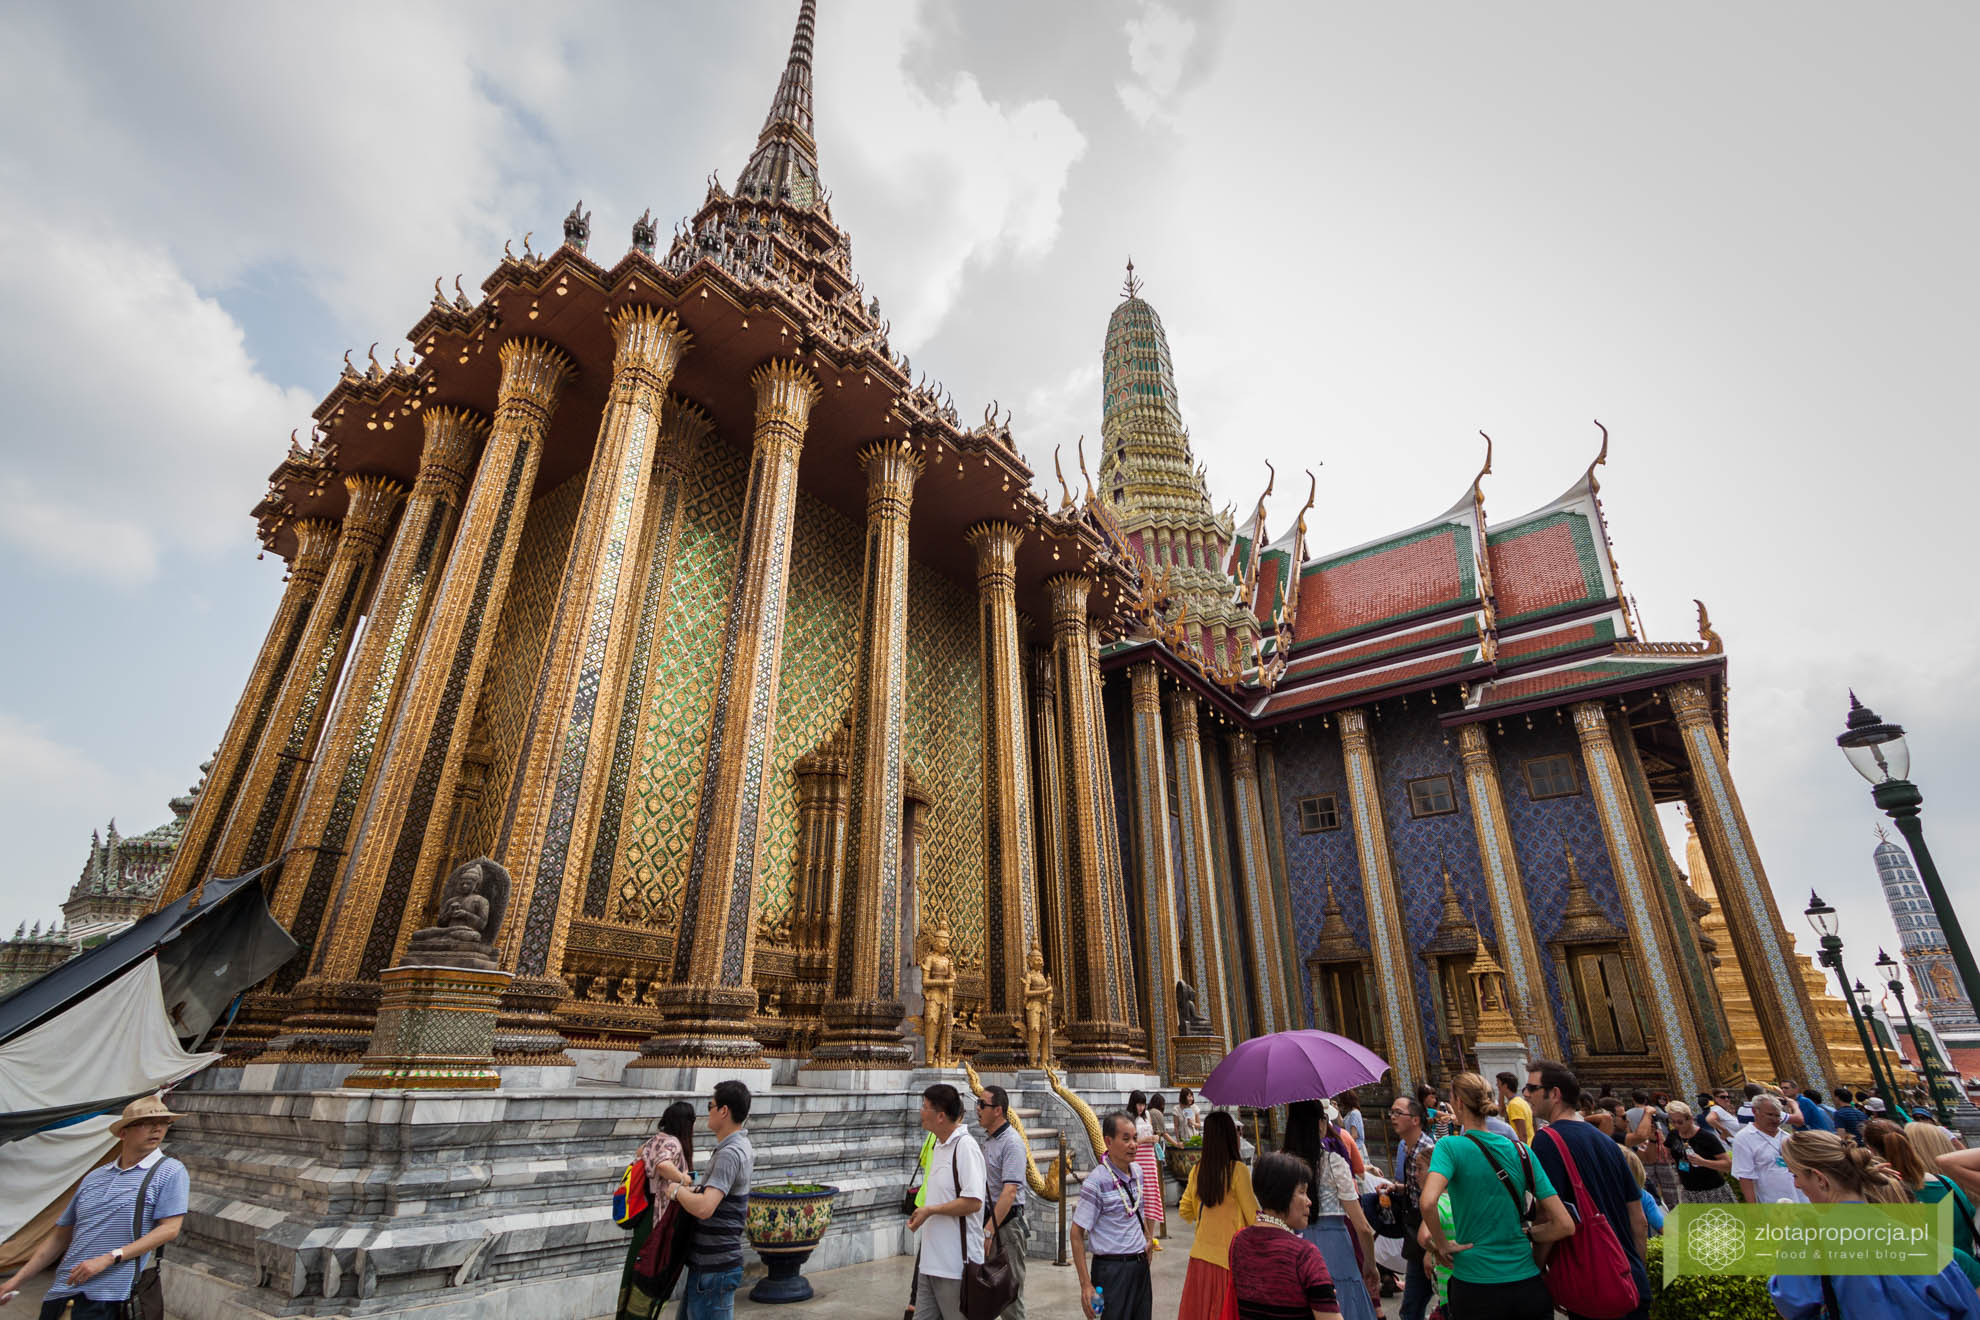 Bangkok,Bangkok, Tajlandia, atrakcje Bangkoku, Pałac Królewskie w Bangkoku, Wat Phra Kaew, swiątynia Szmaragdowego Buddy Tajlandia, atrakcje Bangkoku, Pałac Królewskie w Bangkoku